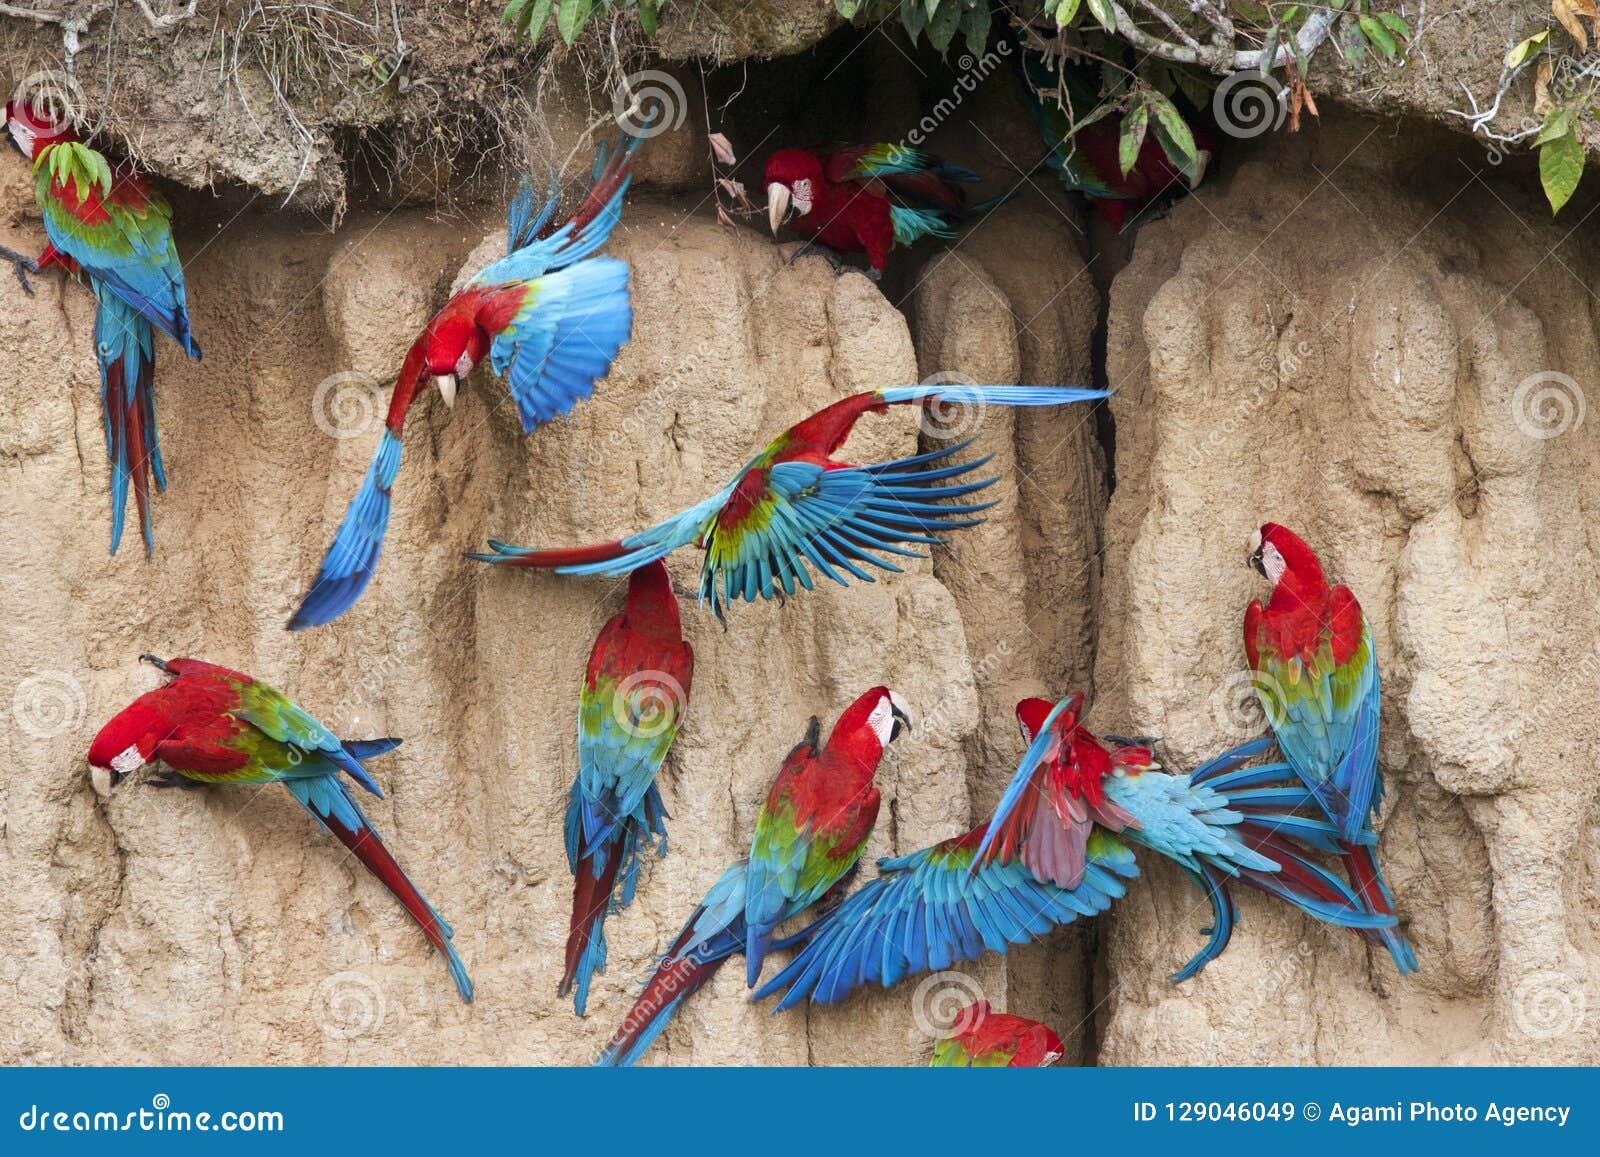 Groenvleugelara,红和绿的金刚鹦鹉, Ara chloropterus